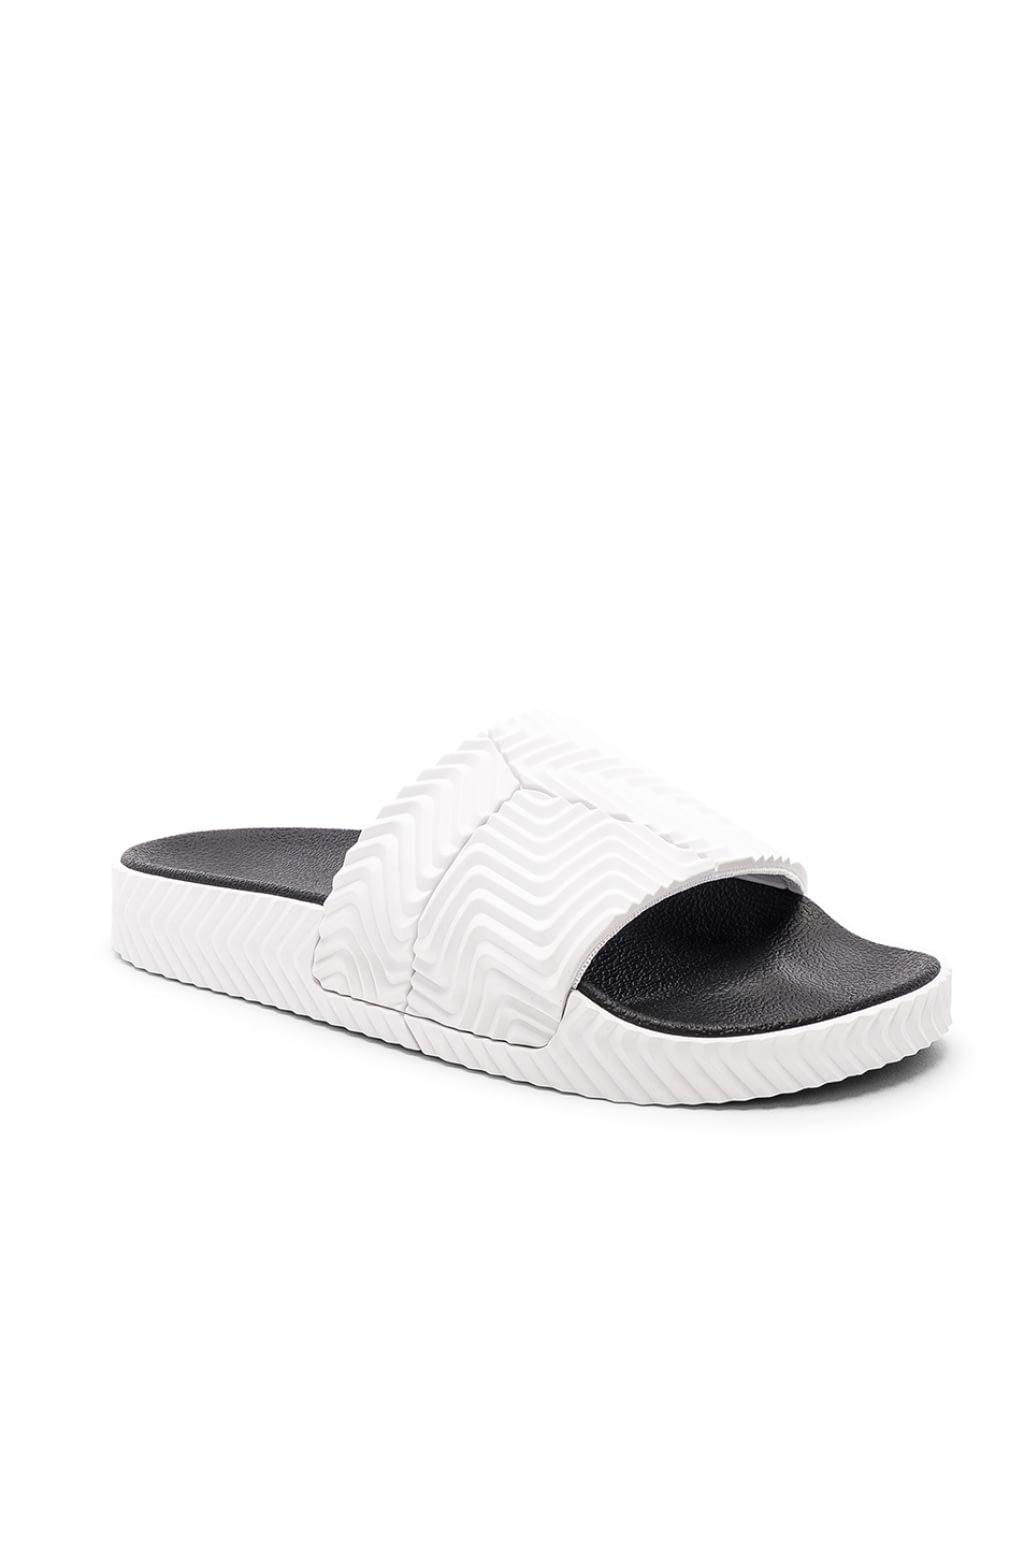 Buy Original Adidas By Alexander Wang Adilette Slides At Indonesia Sendal